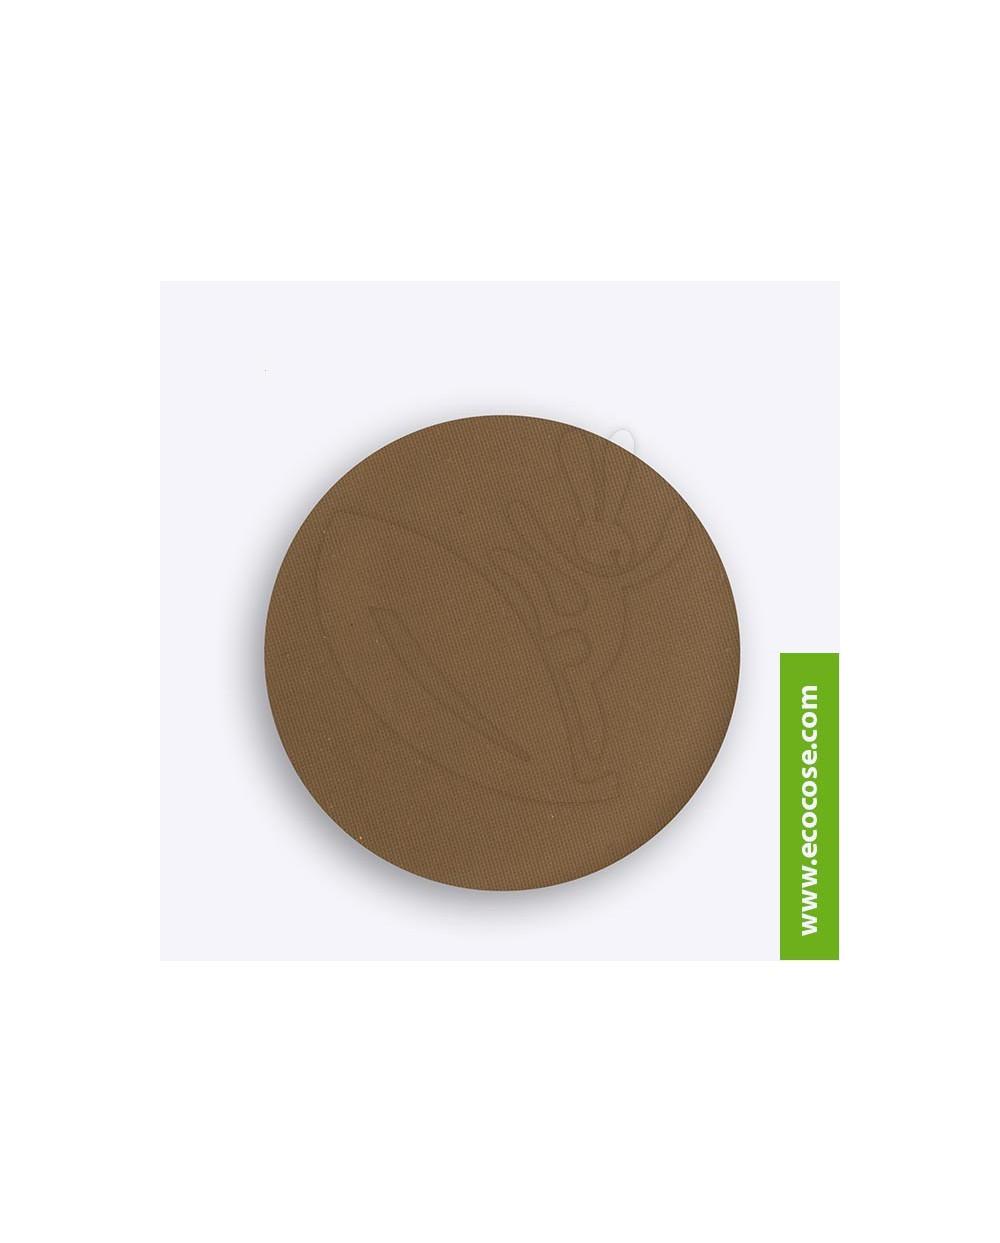 PuroBIO Cosmetics - Resplendent - Bronzer Terra 01 REFILL